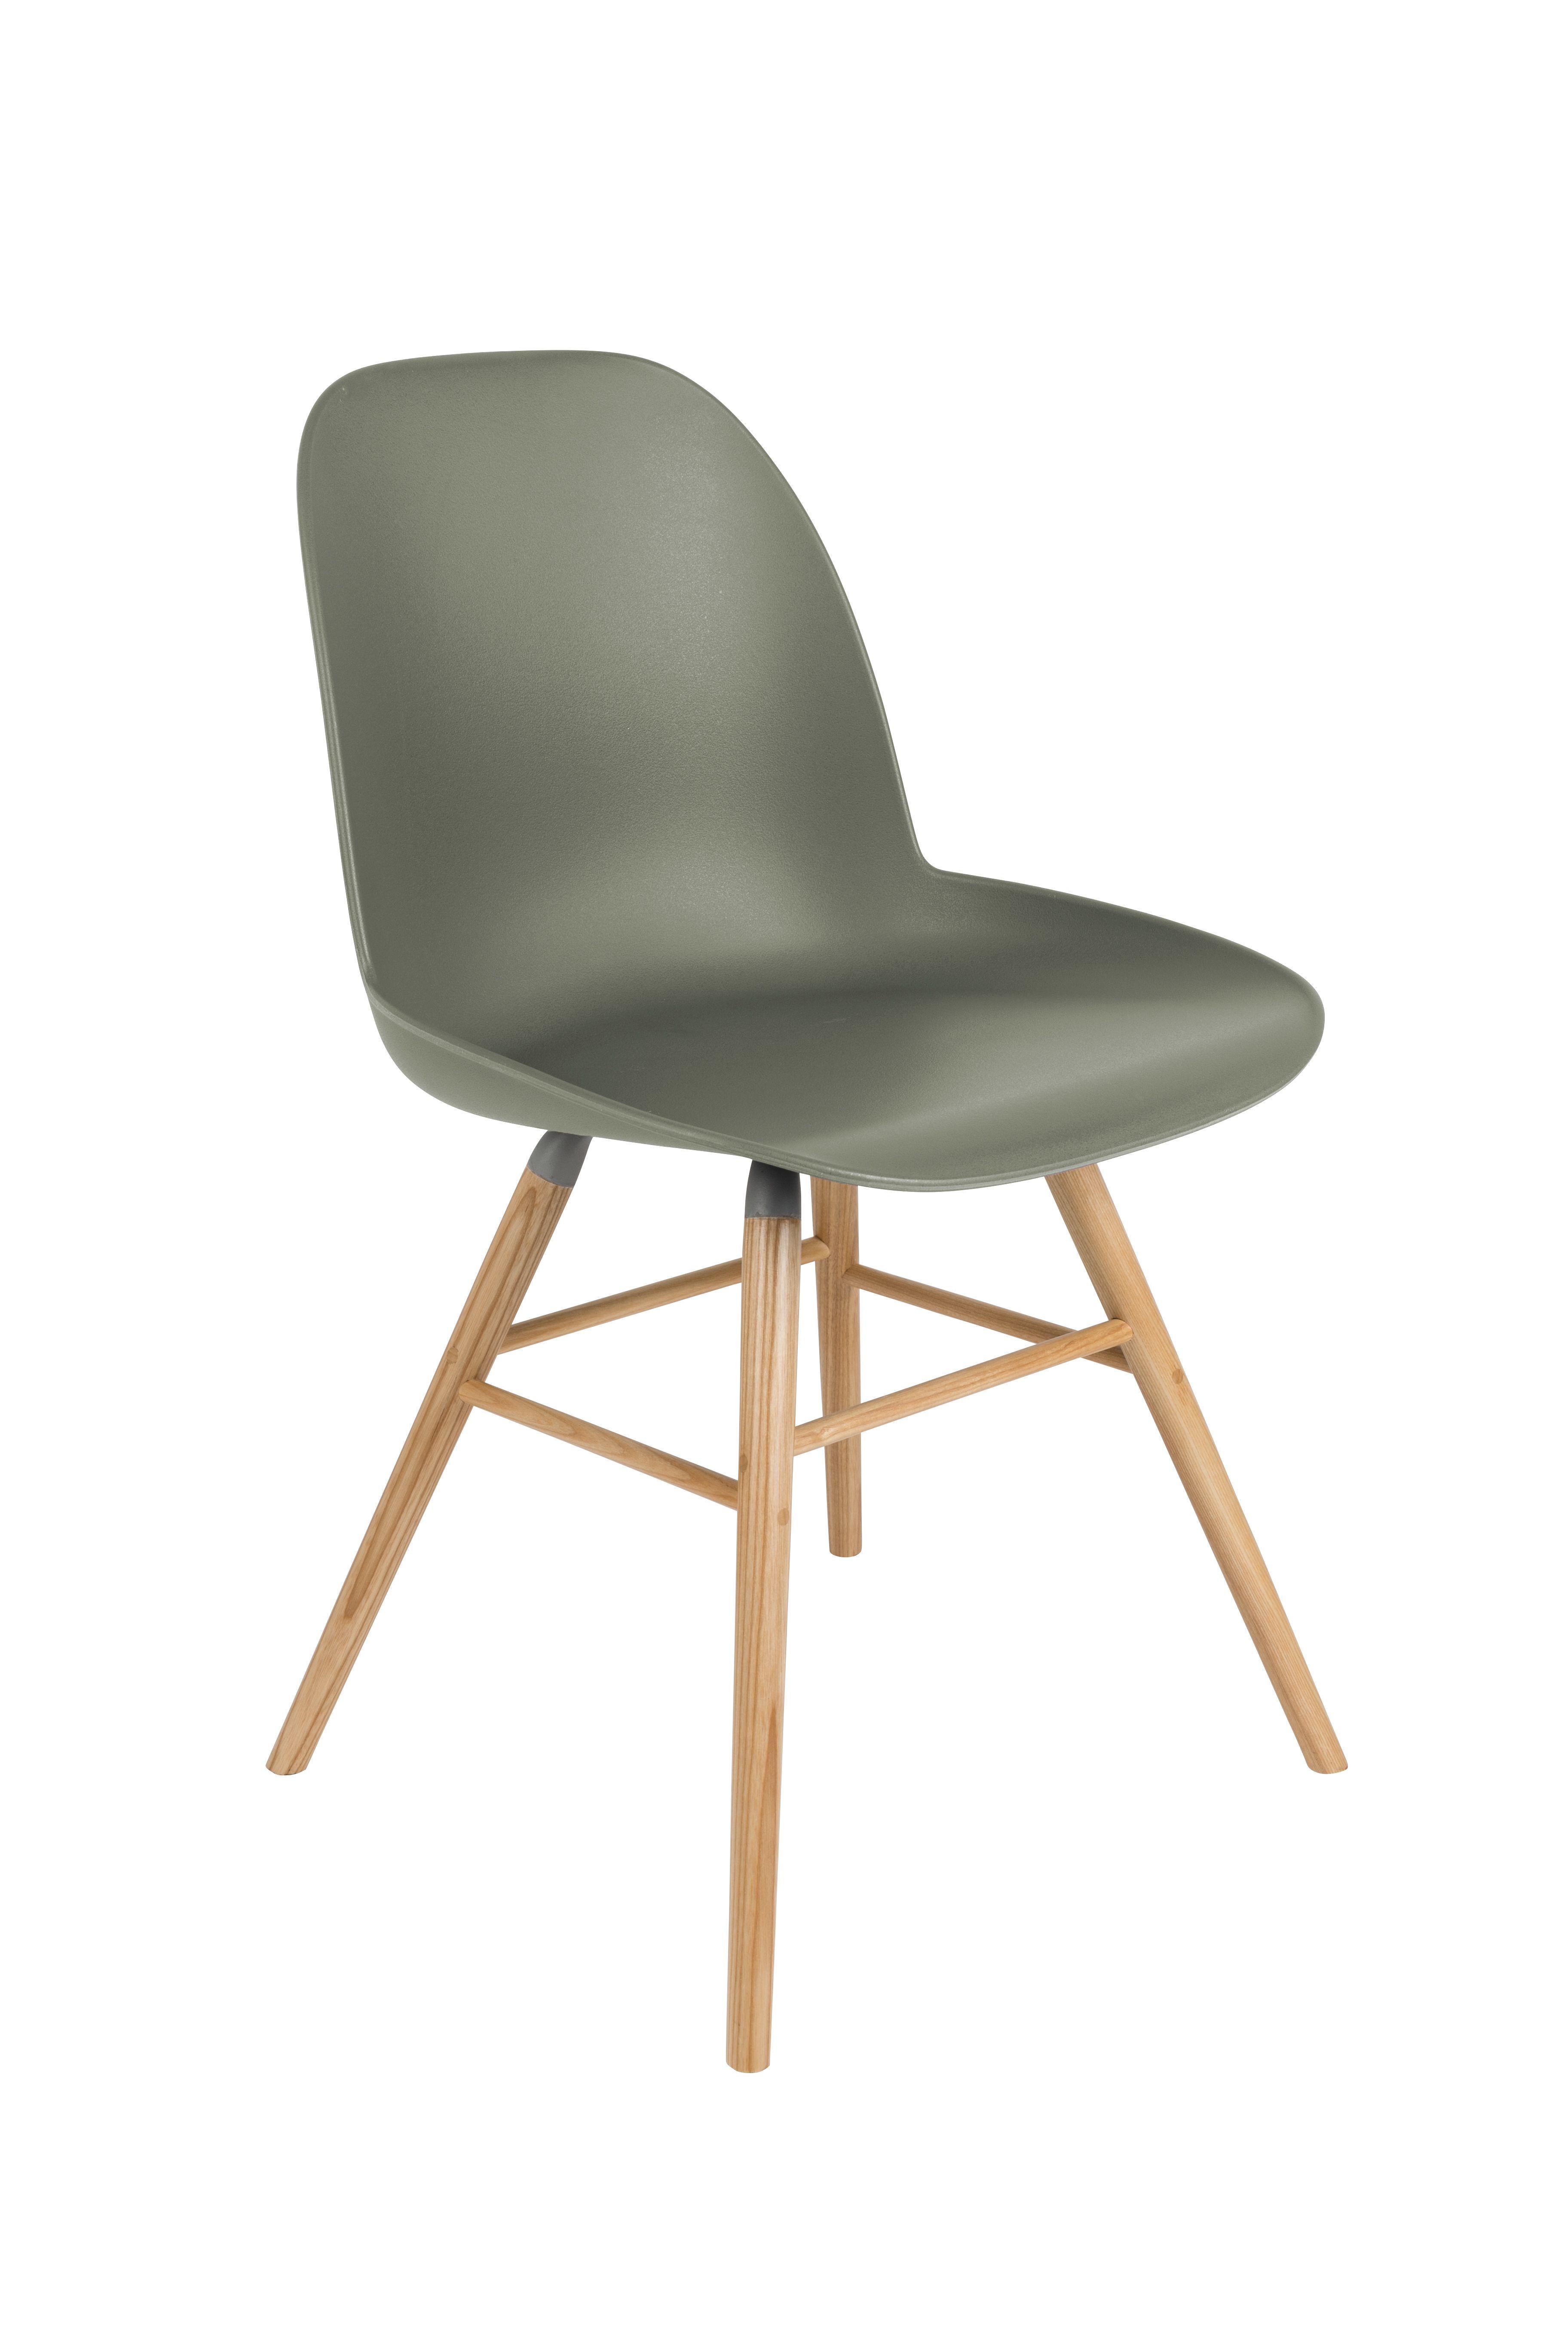 Eettafel Stoelen Beige.Albert Kuip Chair Zuiver Chairs Pinterest Chair Dining Table